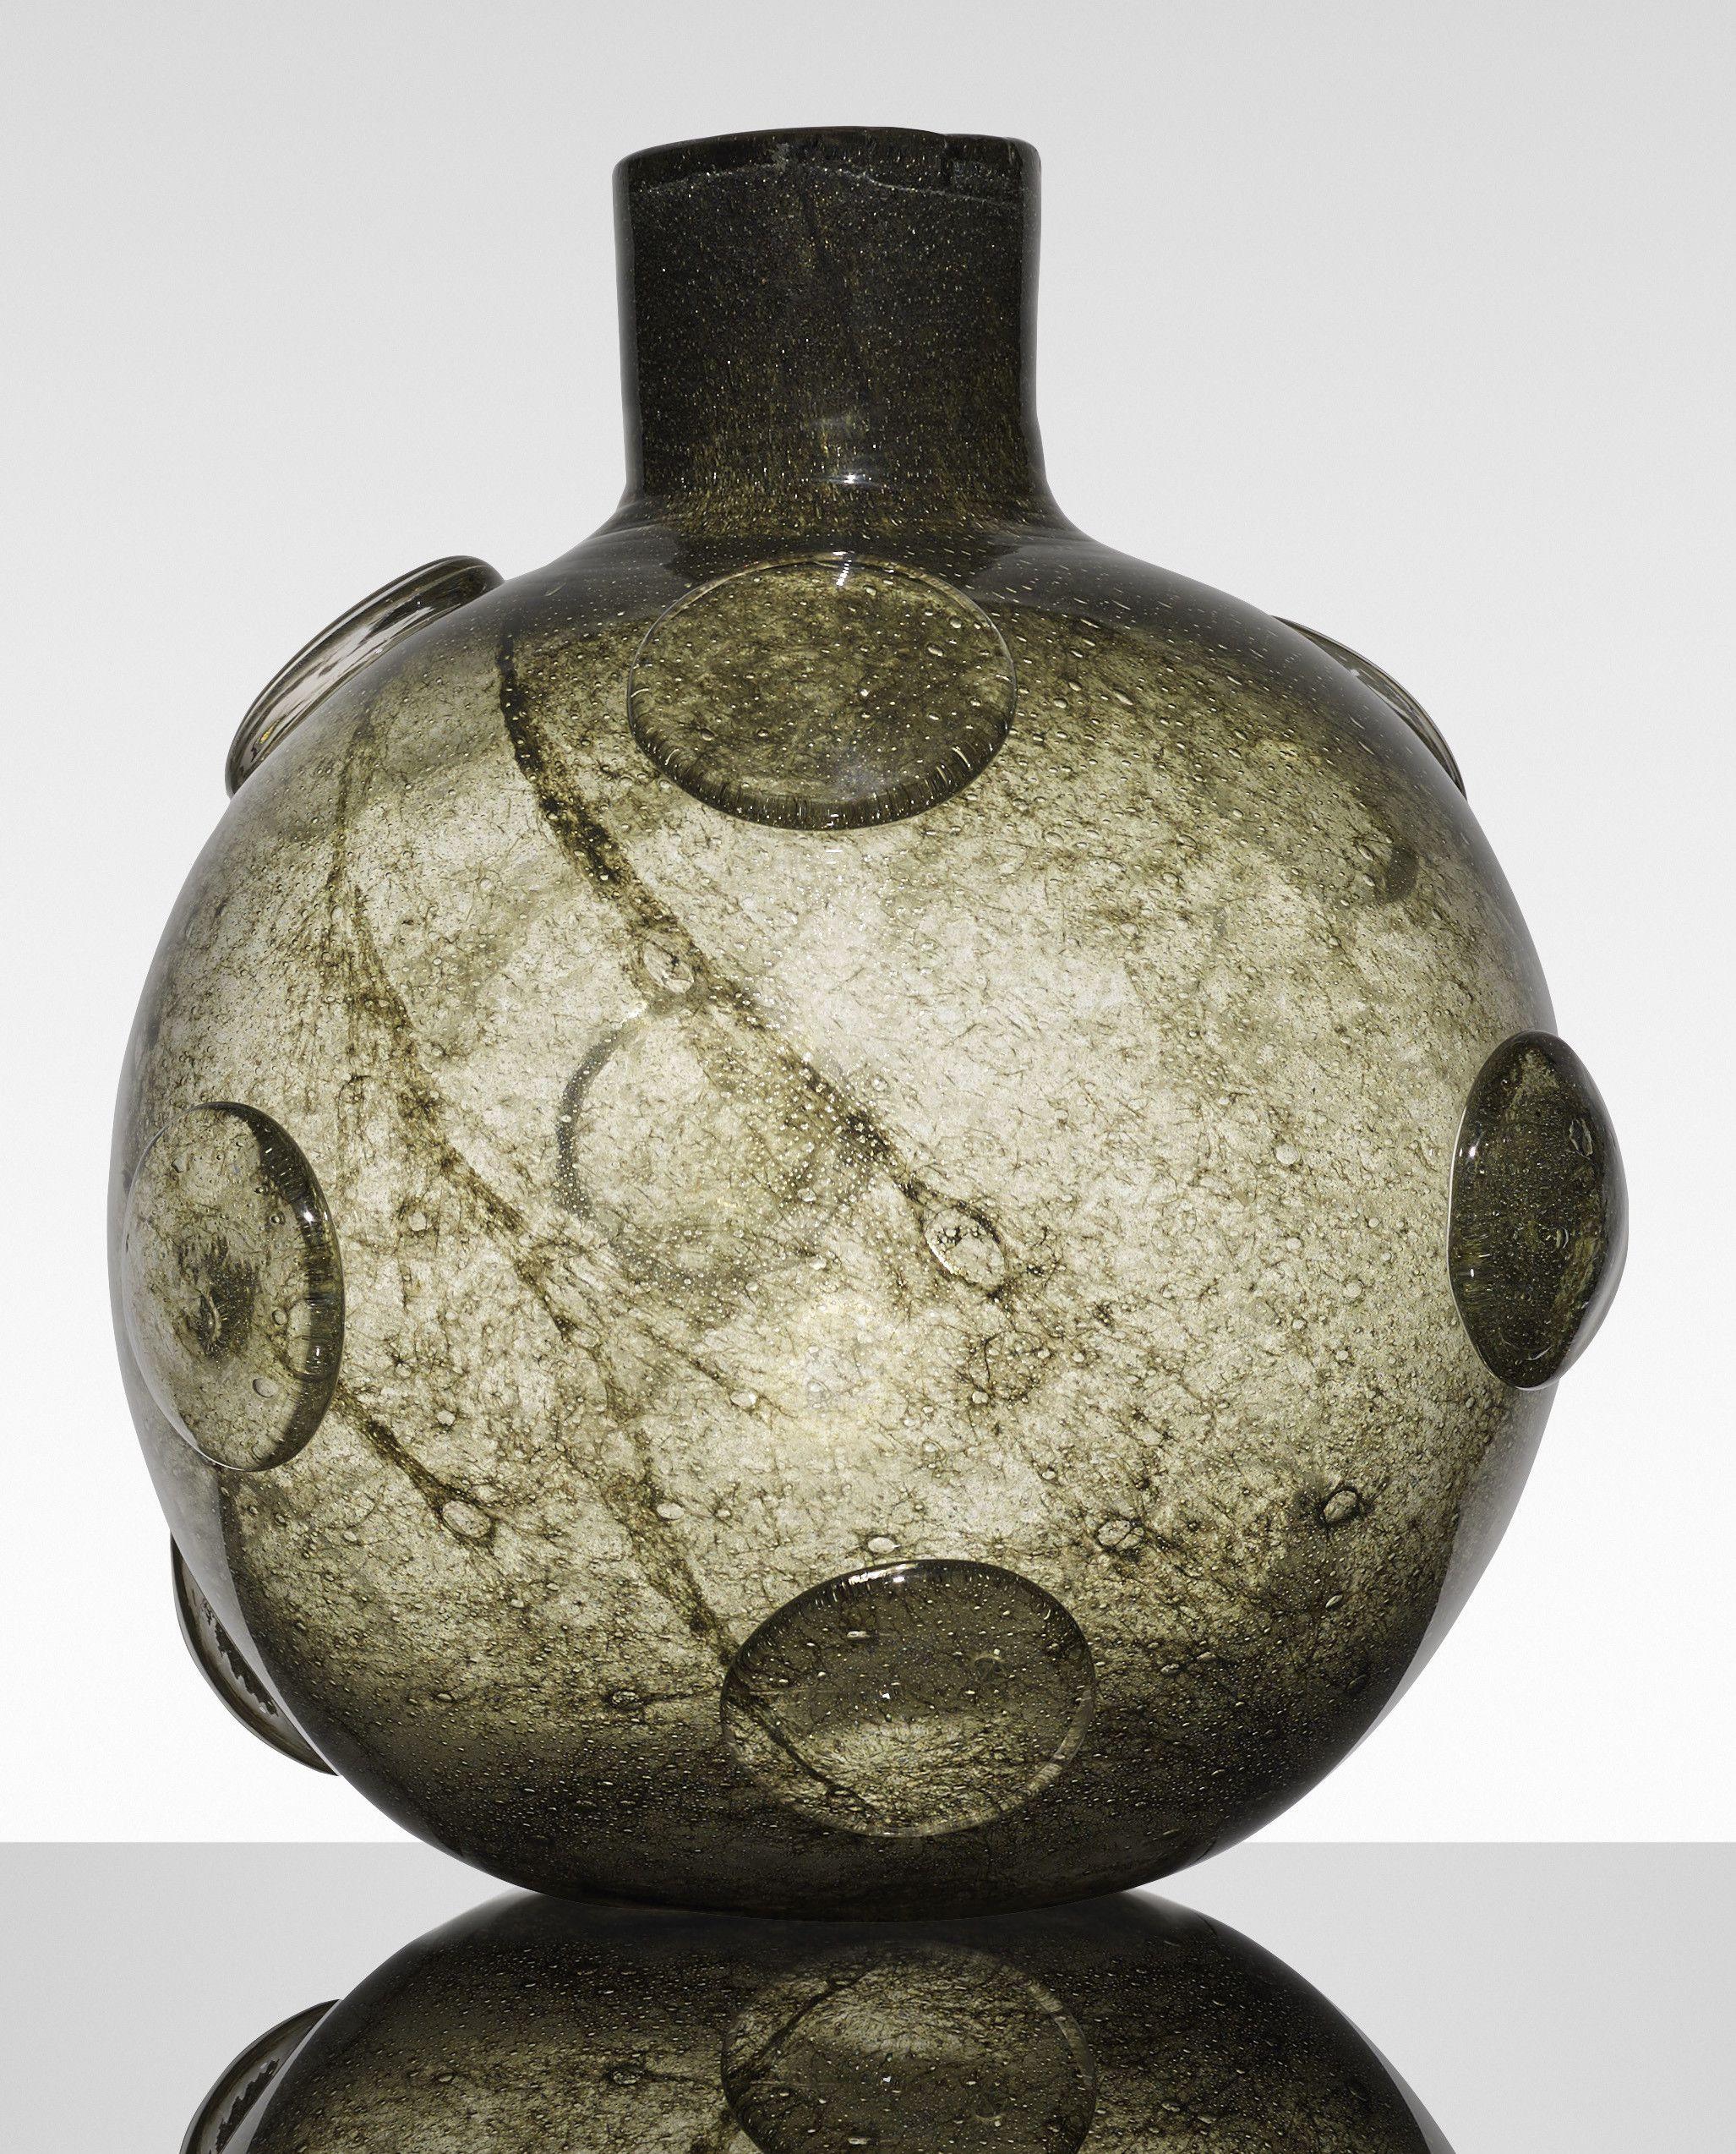 vintage italian glass vases of ercole barovier crepuscolo vase ferro toso barovier italy 1935 36 throughout ercole barovier crepuscolo vase ferro toso barovier italy 1935 36 internally decor